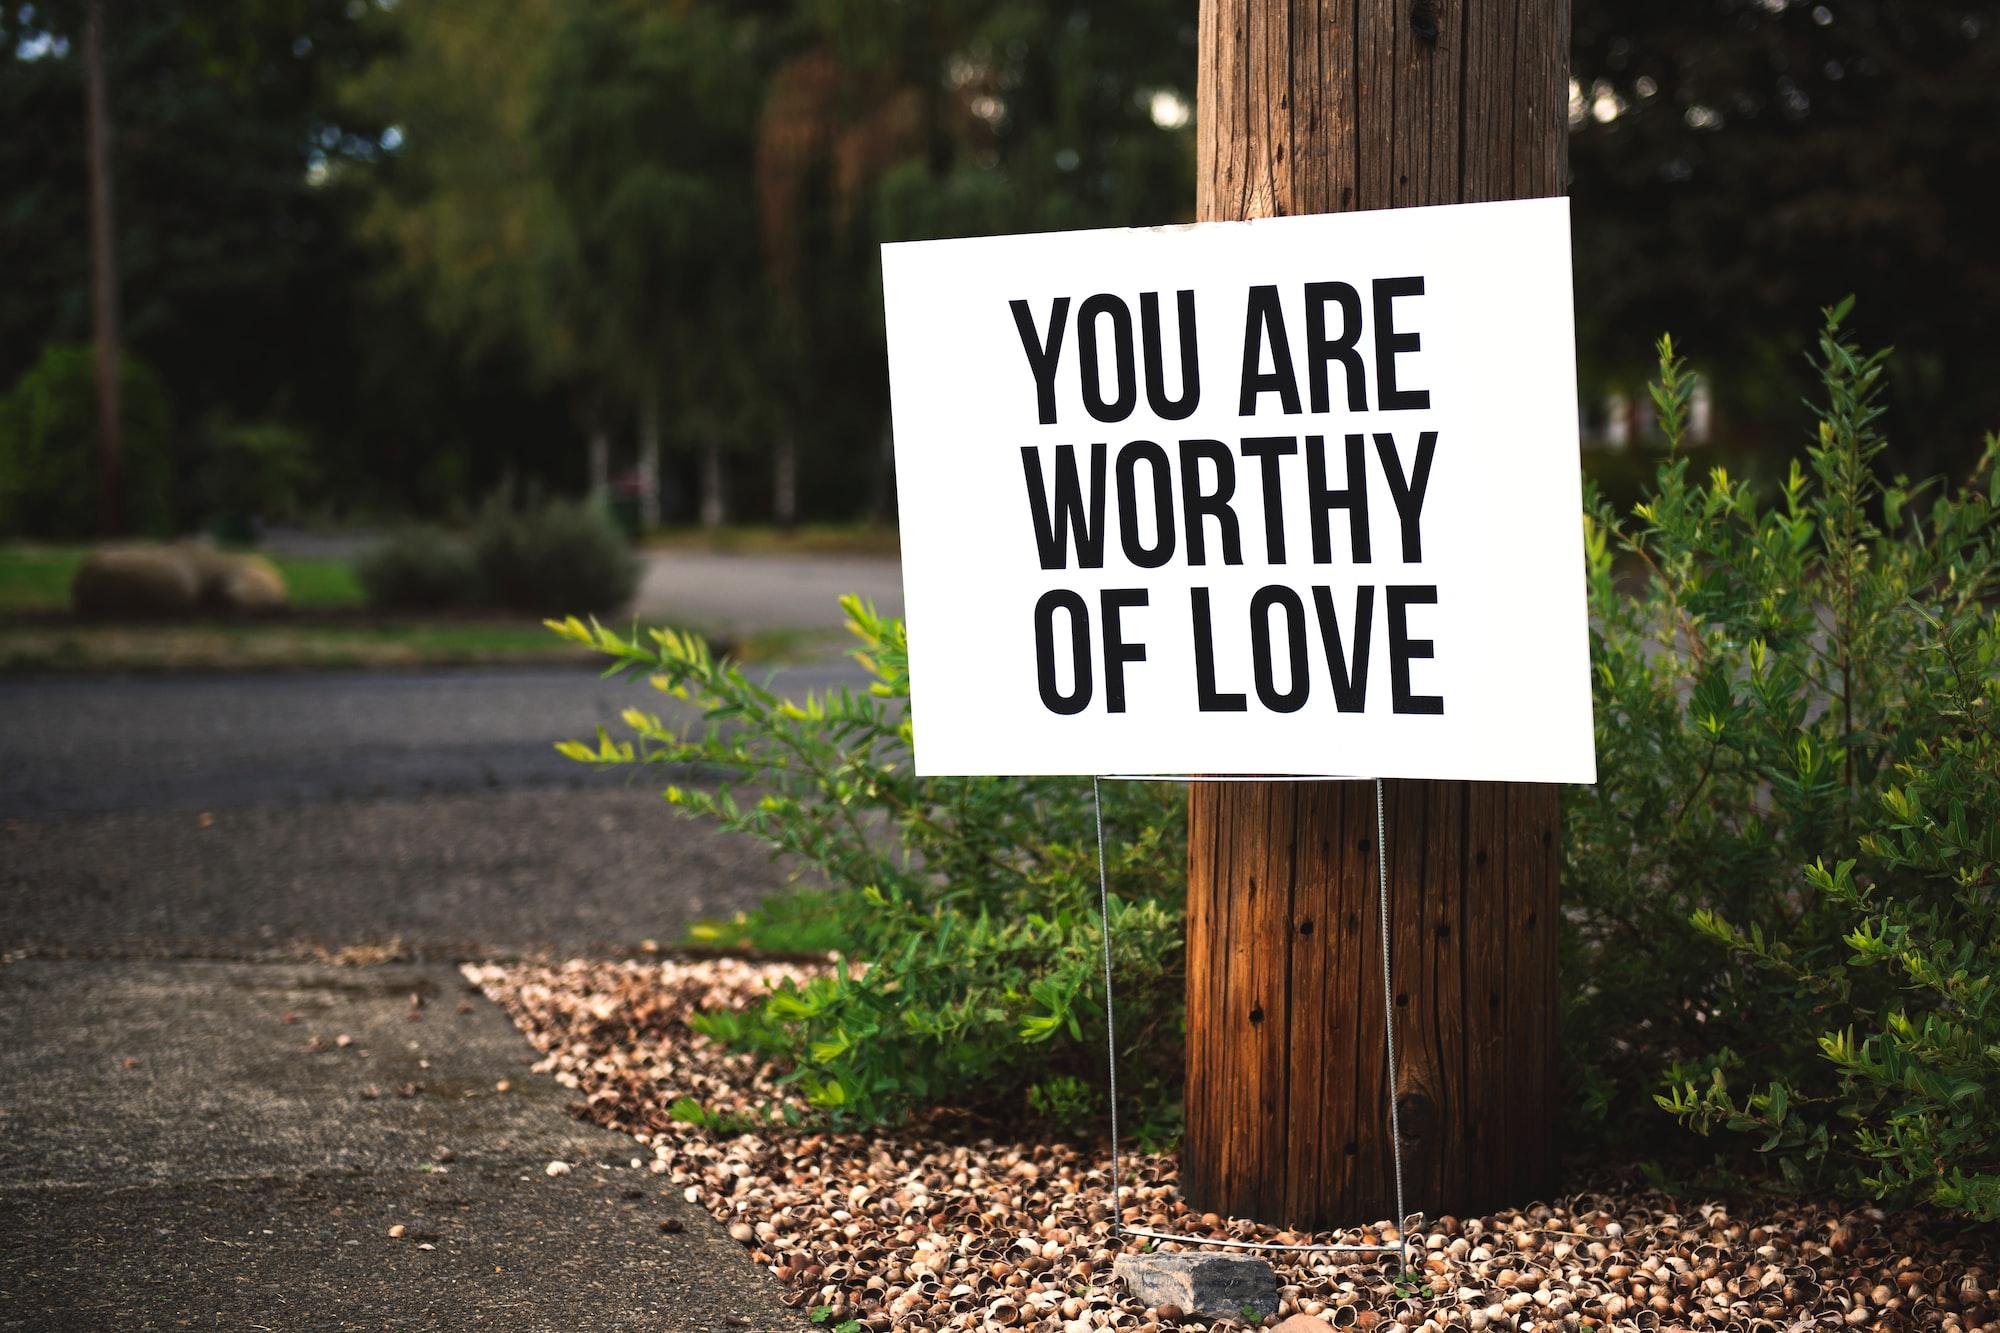 Worthy of Love | Instagram: @timmossholder